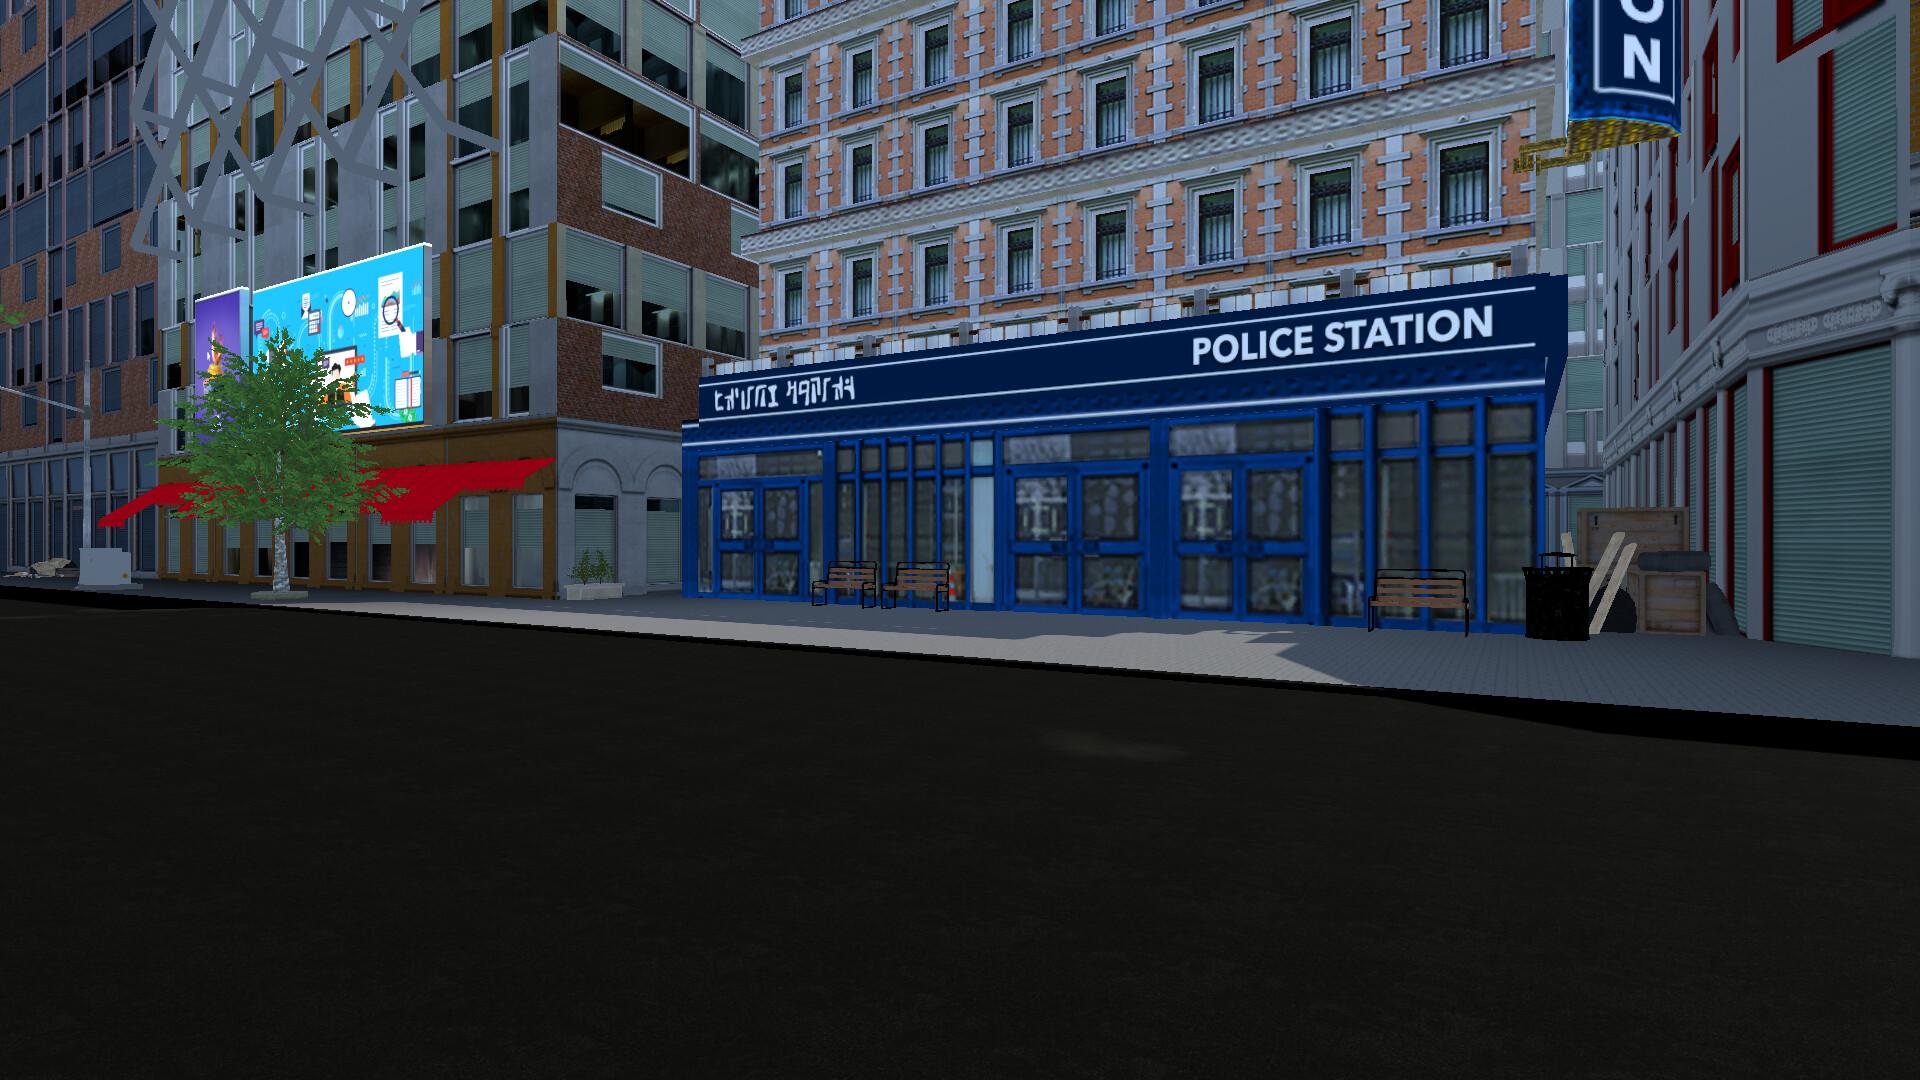 Jayson bennett police station